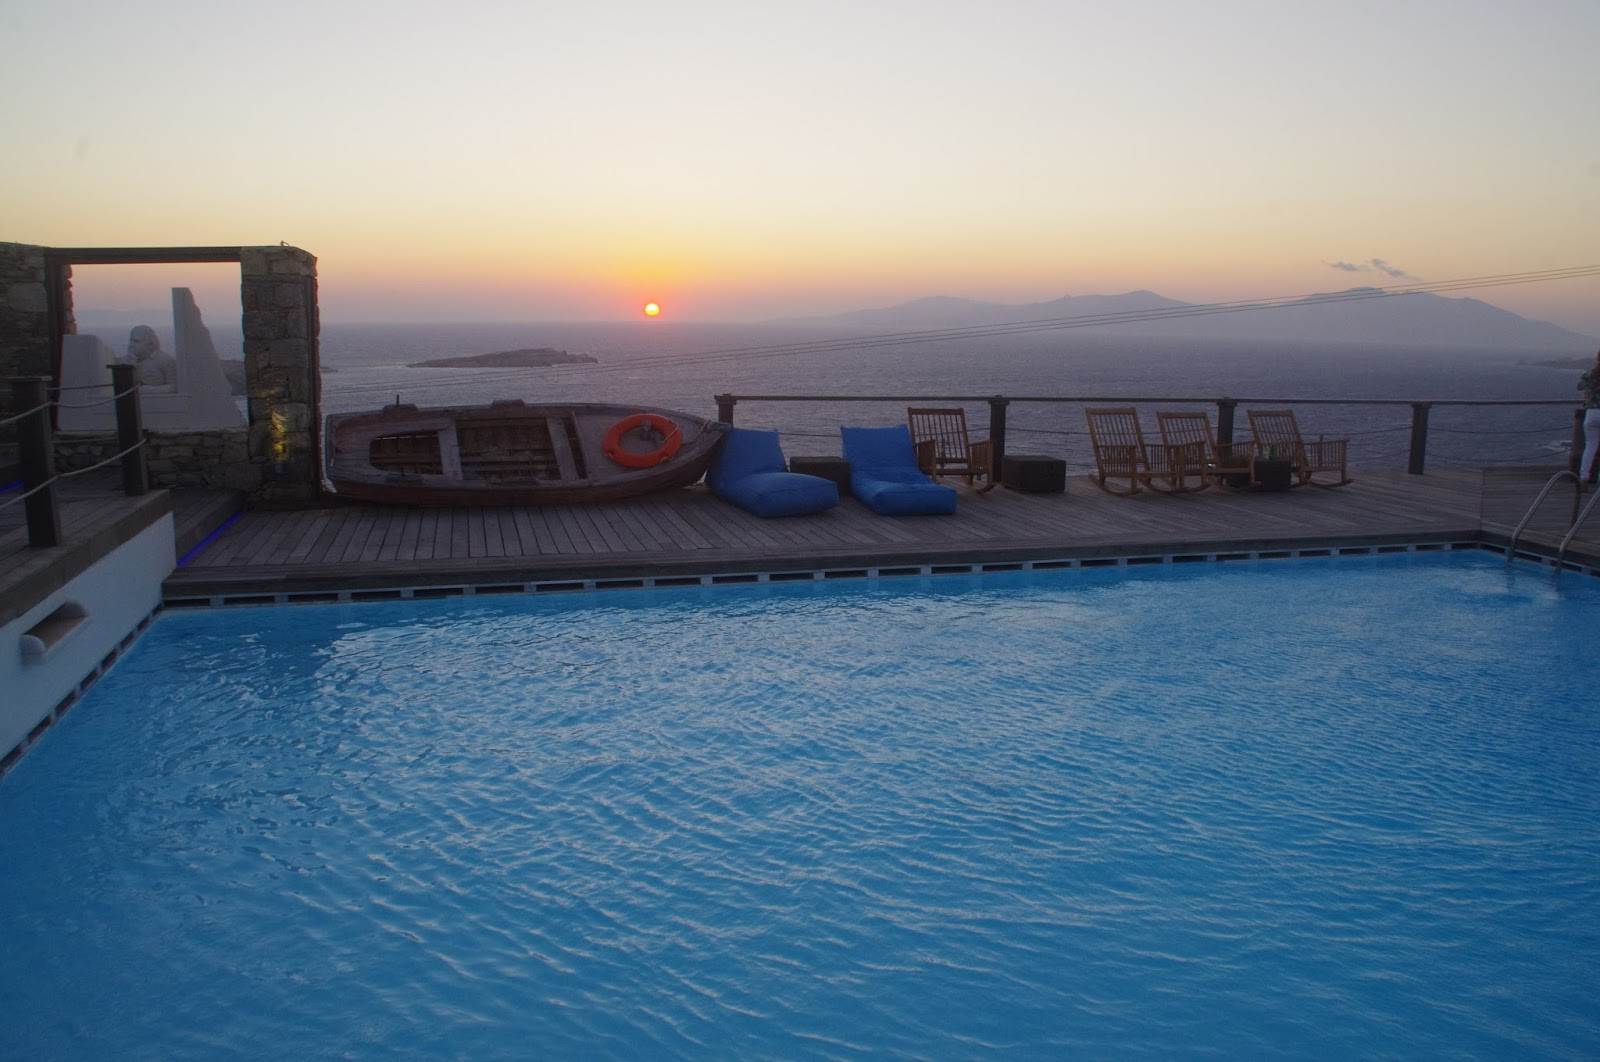 Tharroe of Mykonos Sunset over pool